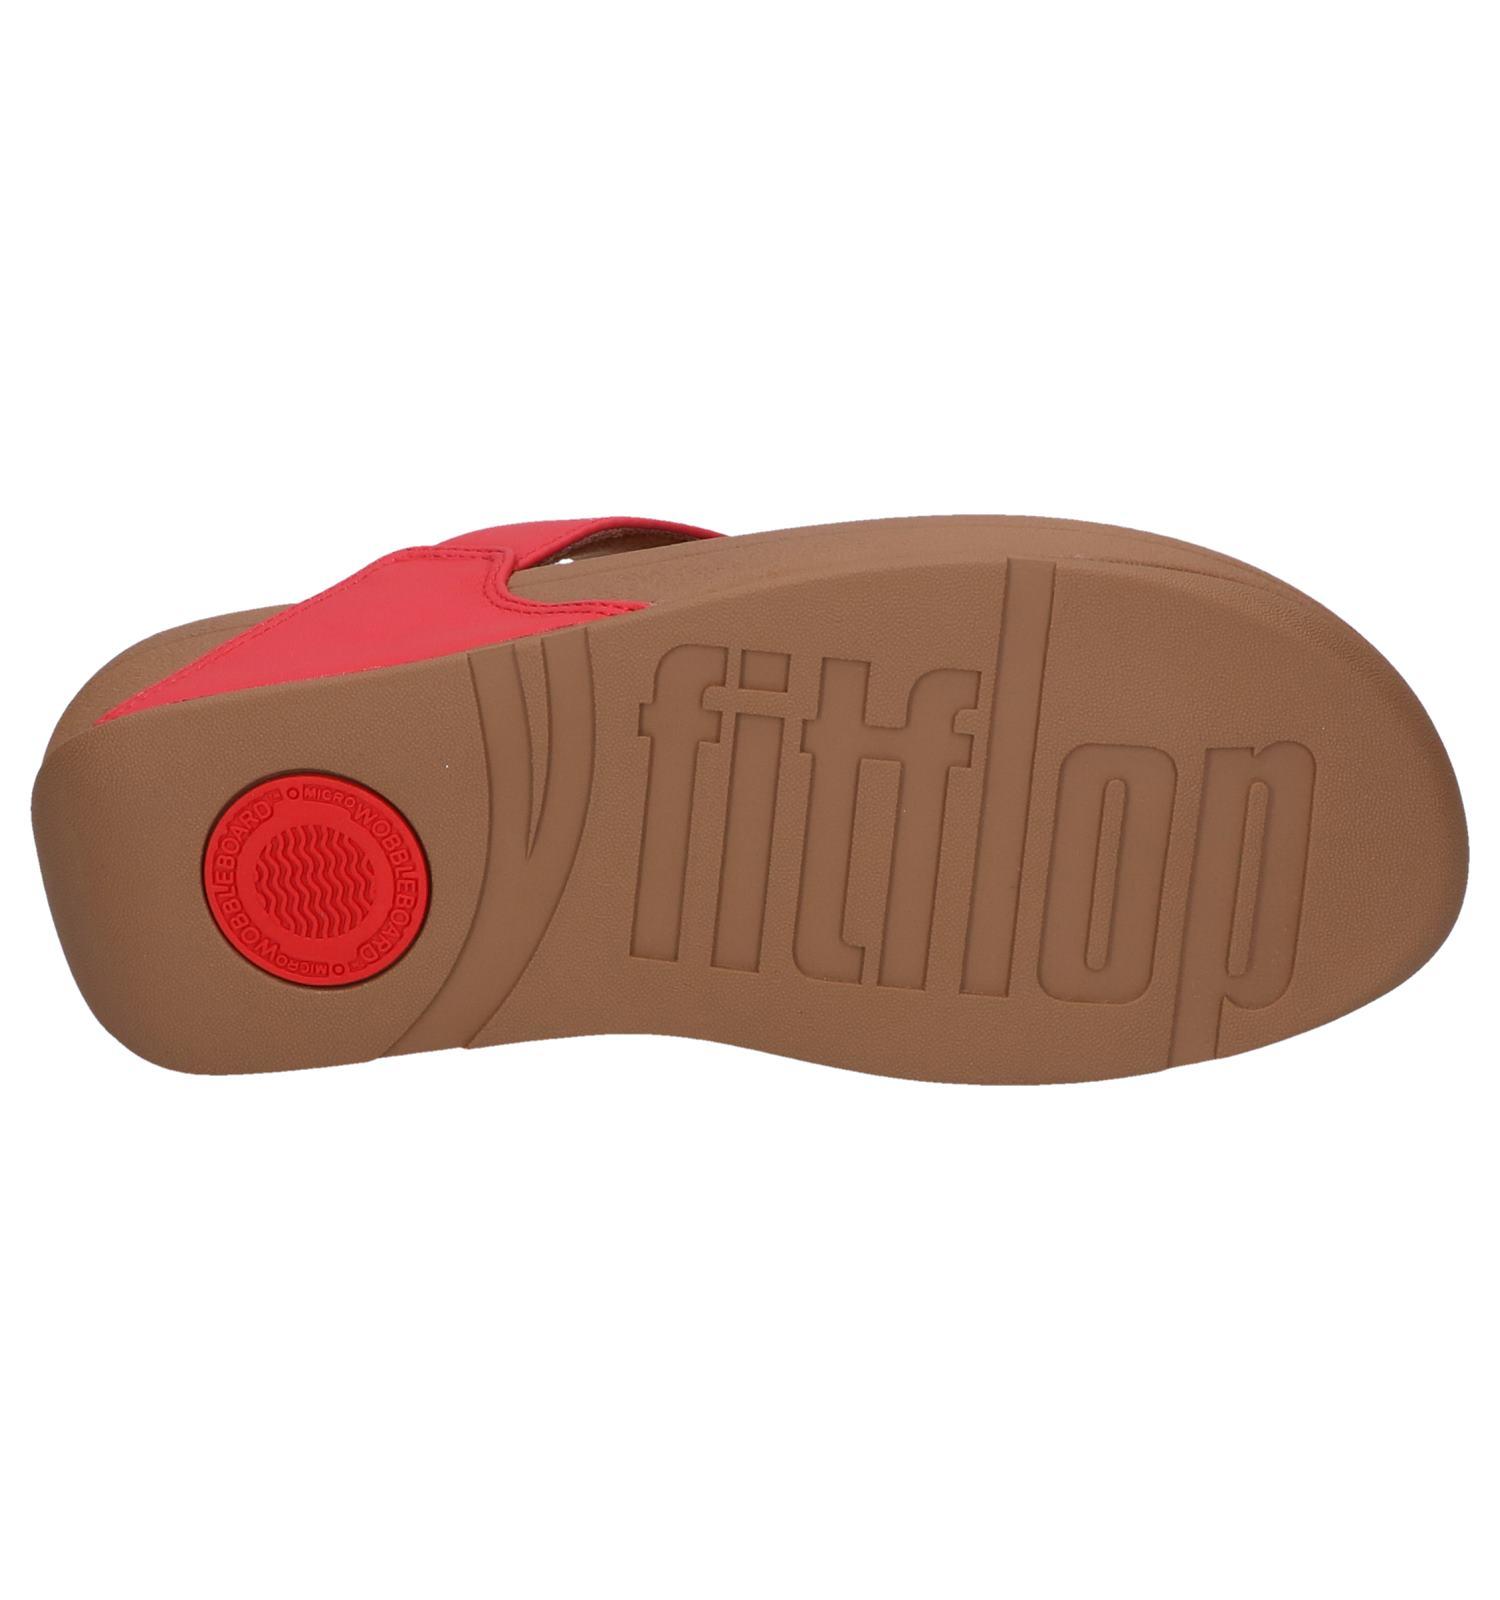 Rode Fitflop Rode Rode Slippers Lulu Fitflop Slippers Lulu 76ygbfYv